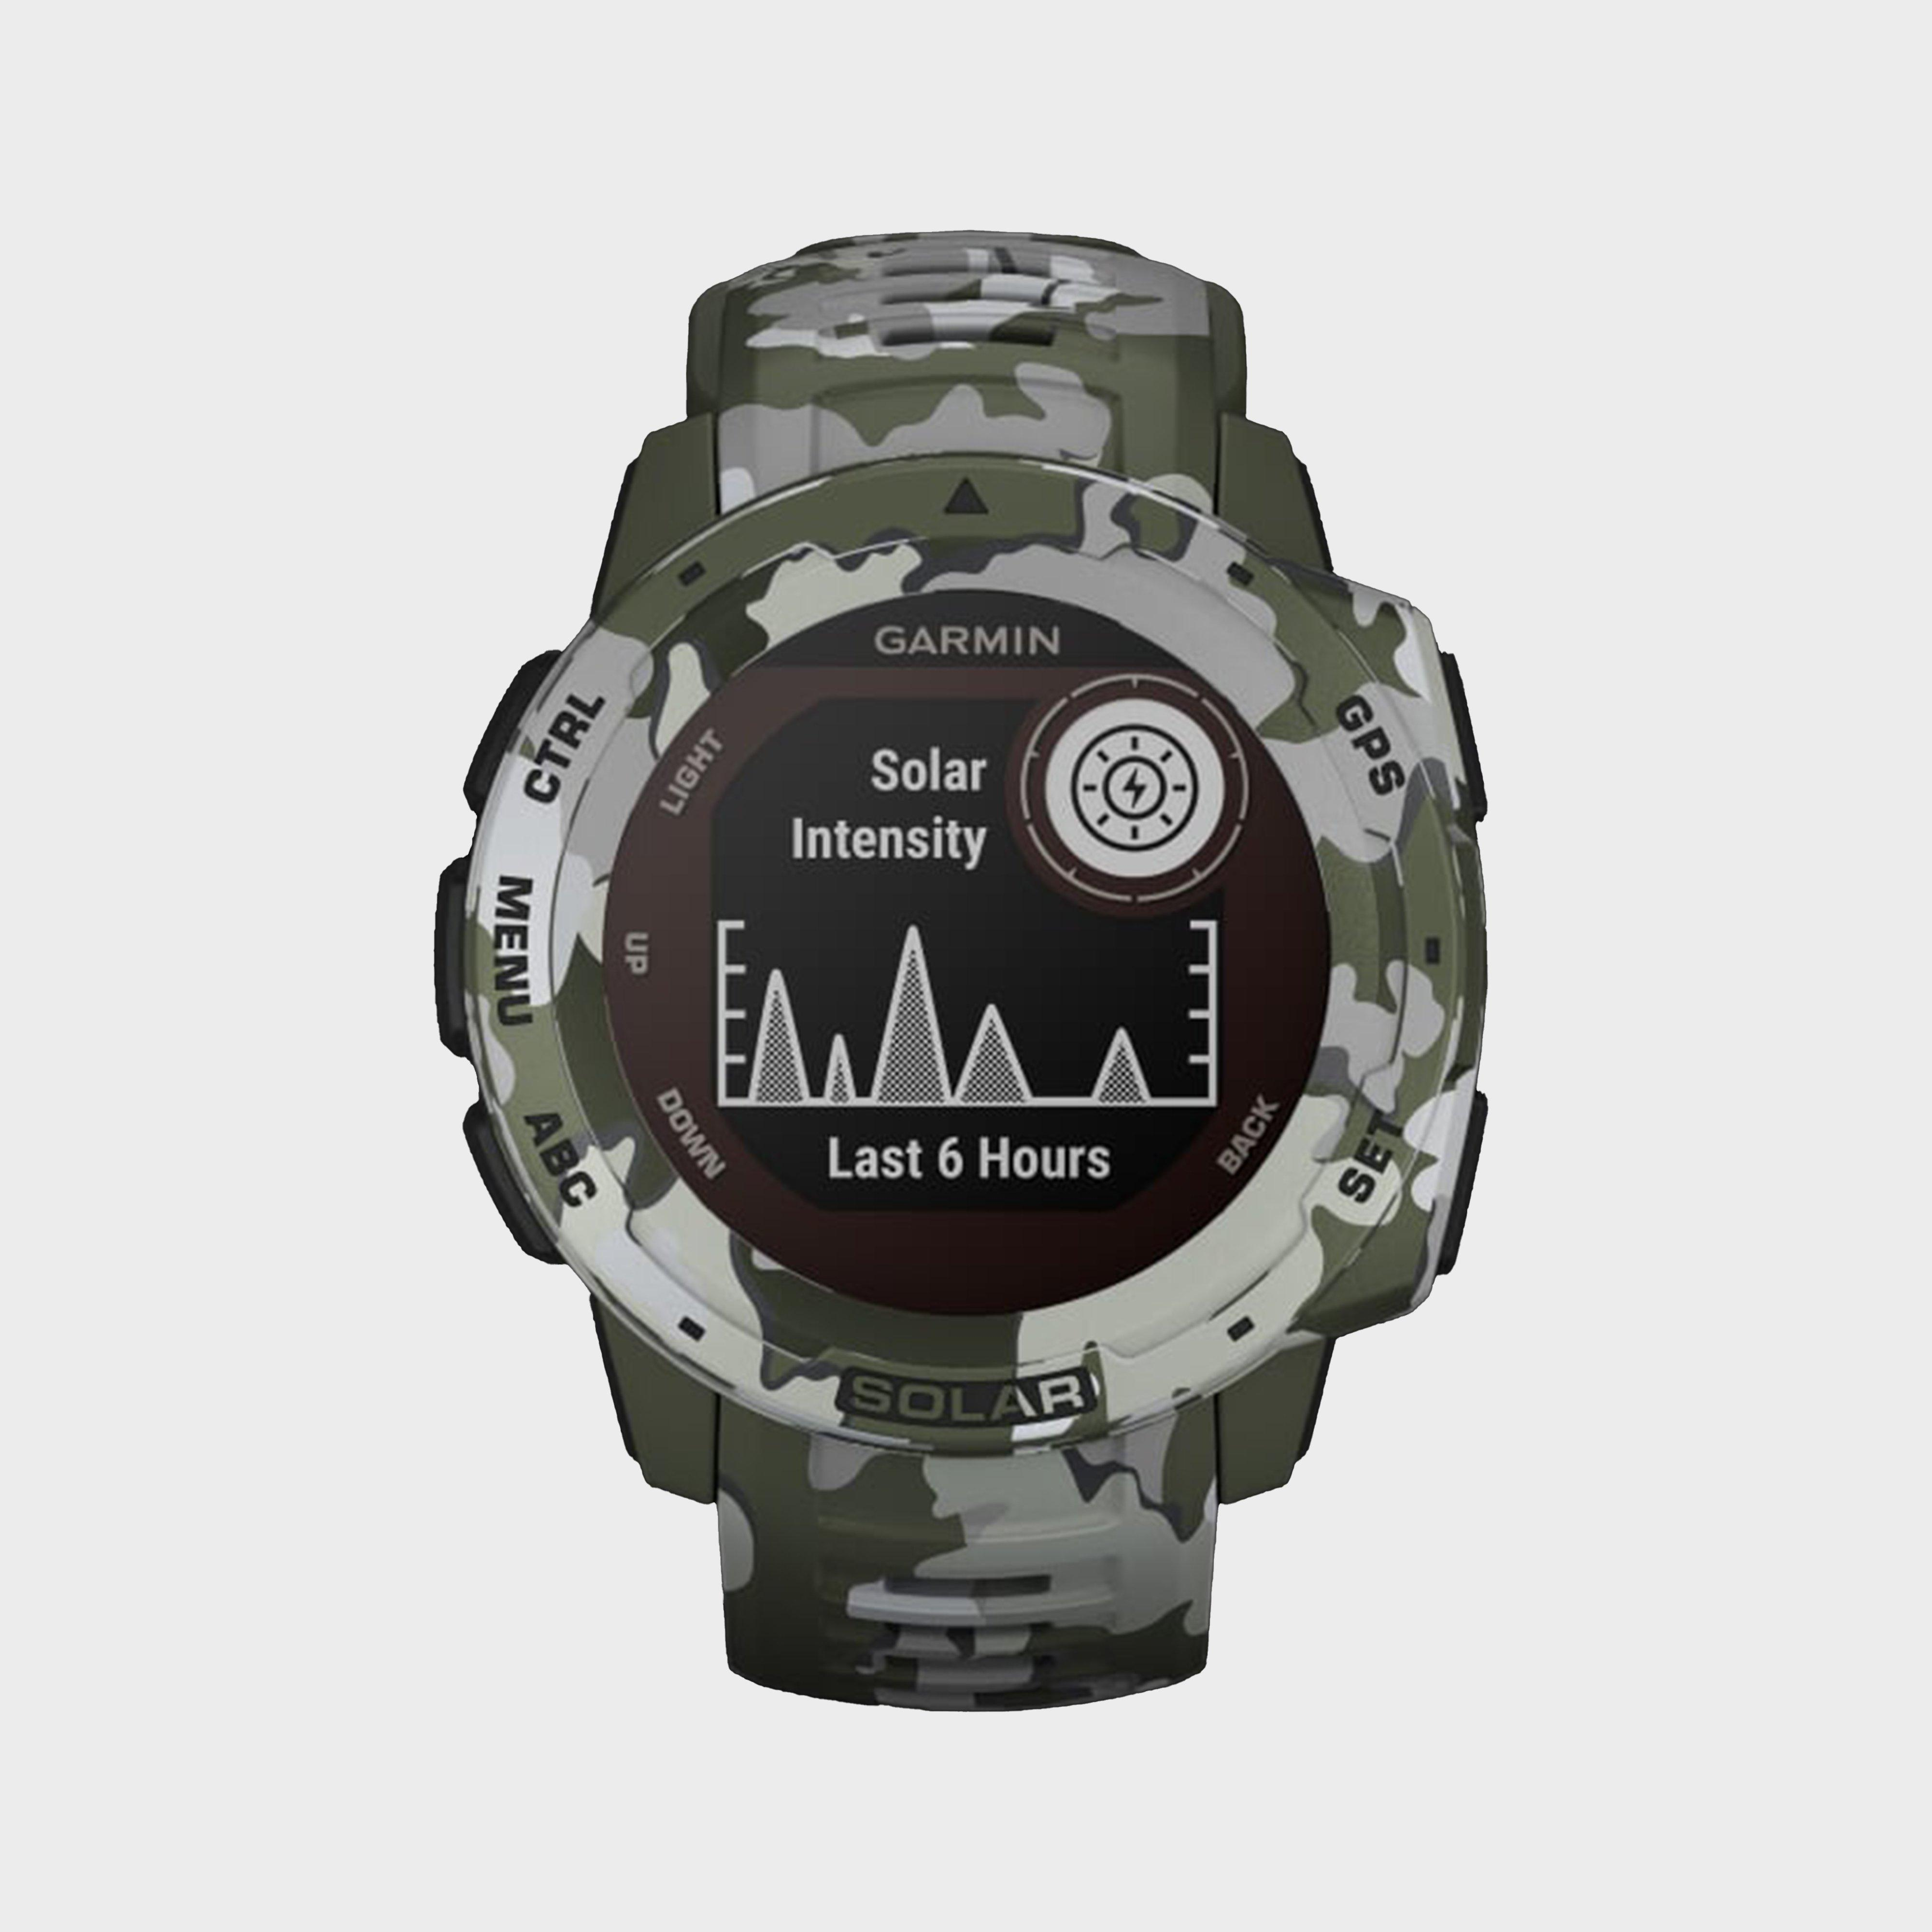 Garmin Instinct Solar Edition Multi-sport Gps Watch - Multi/grn/camo  Multi/grn/camo